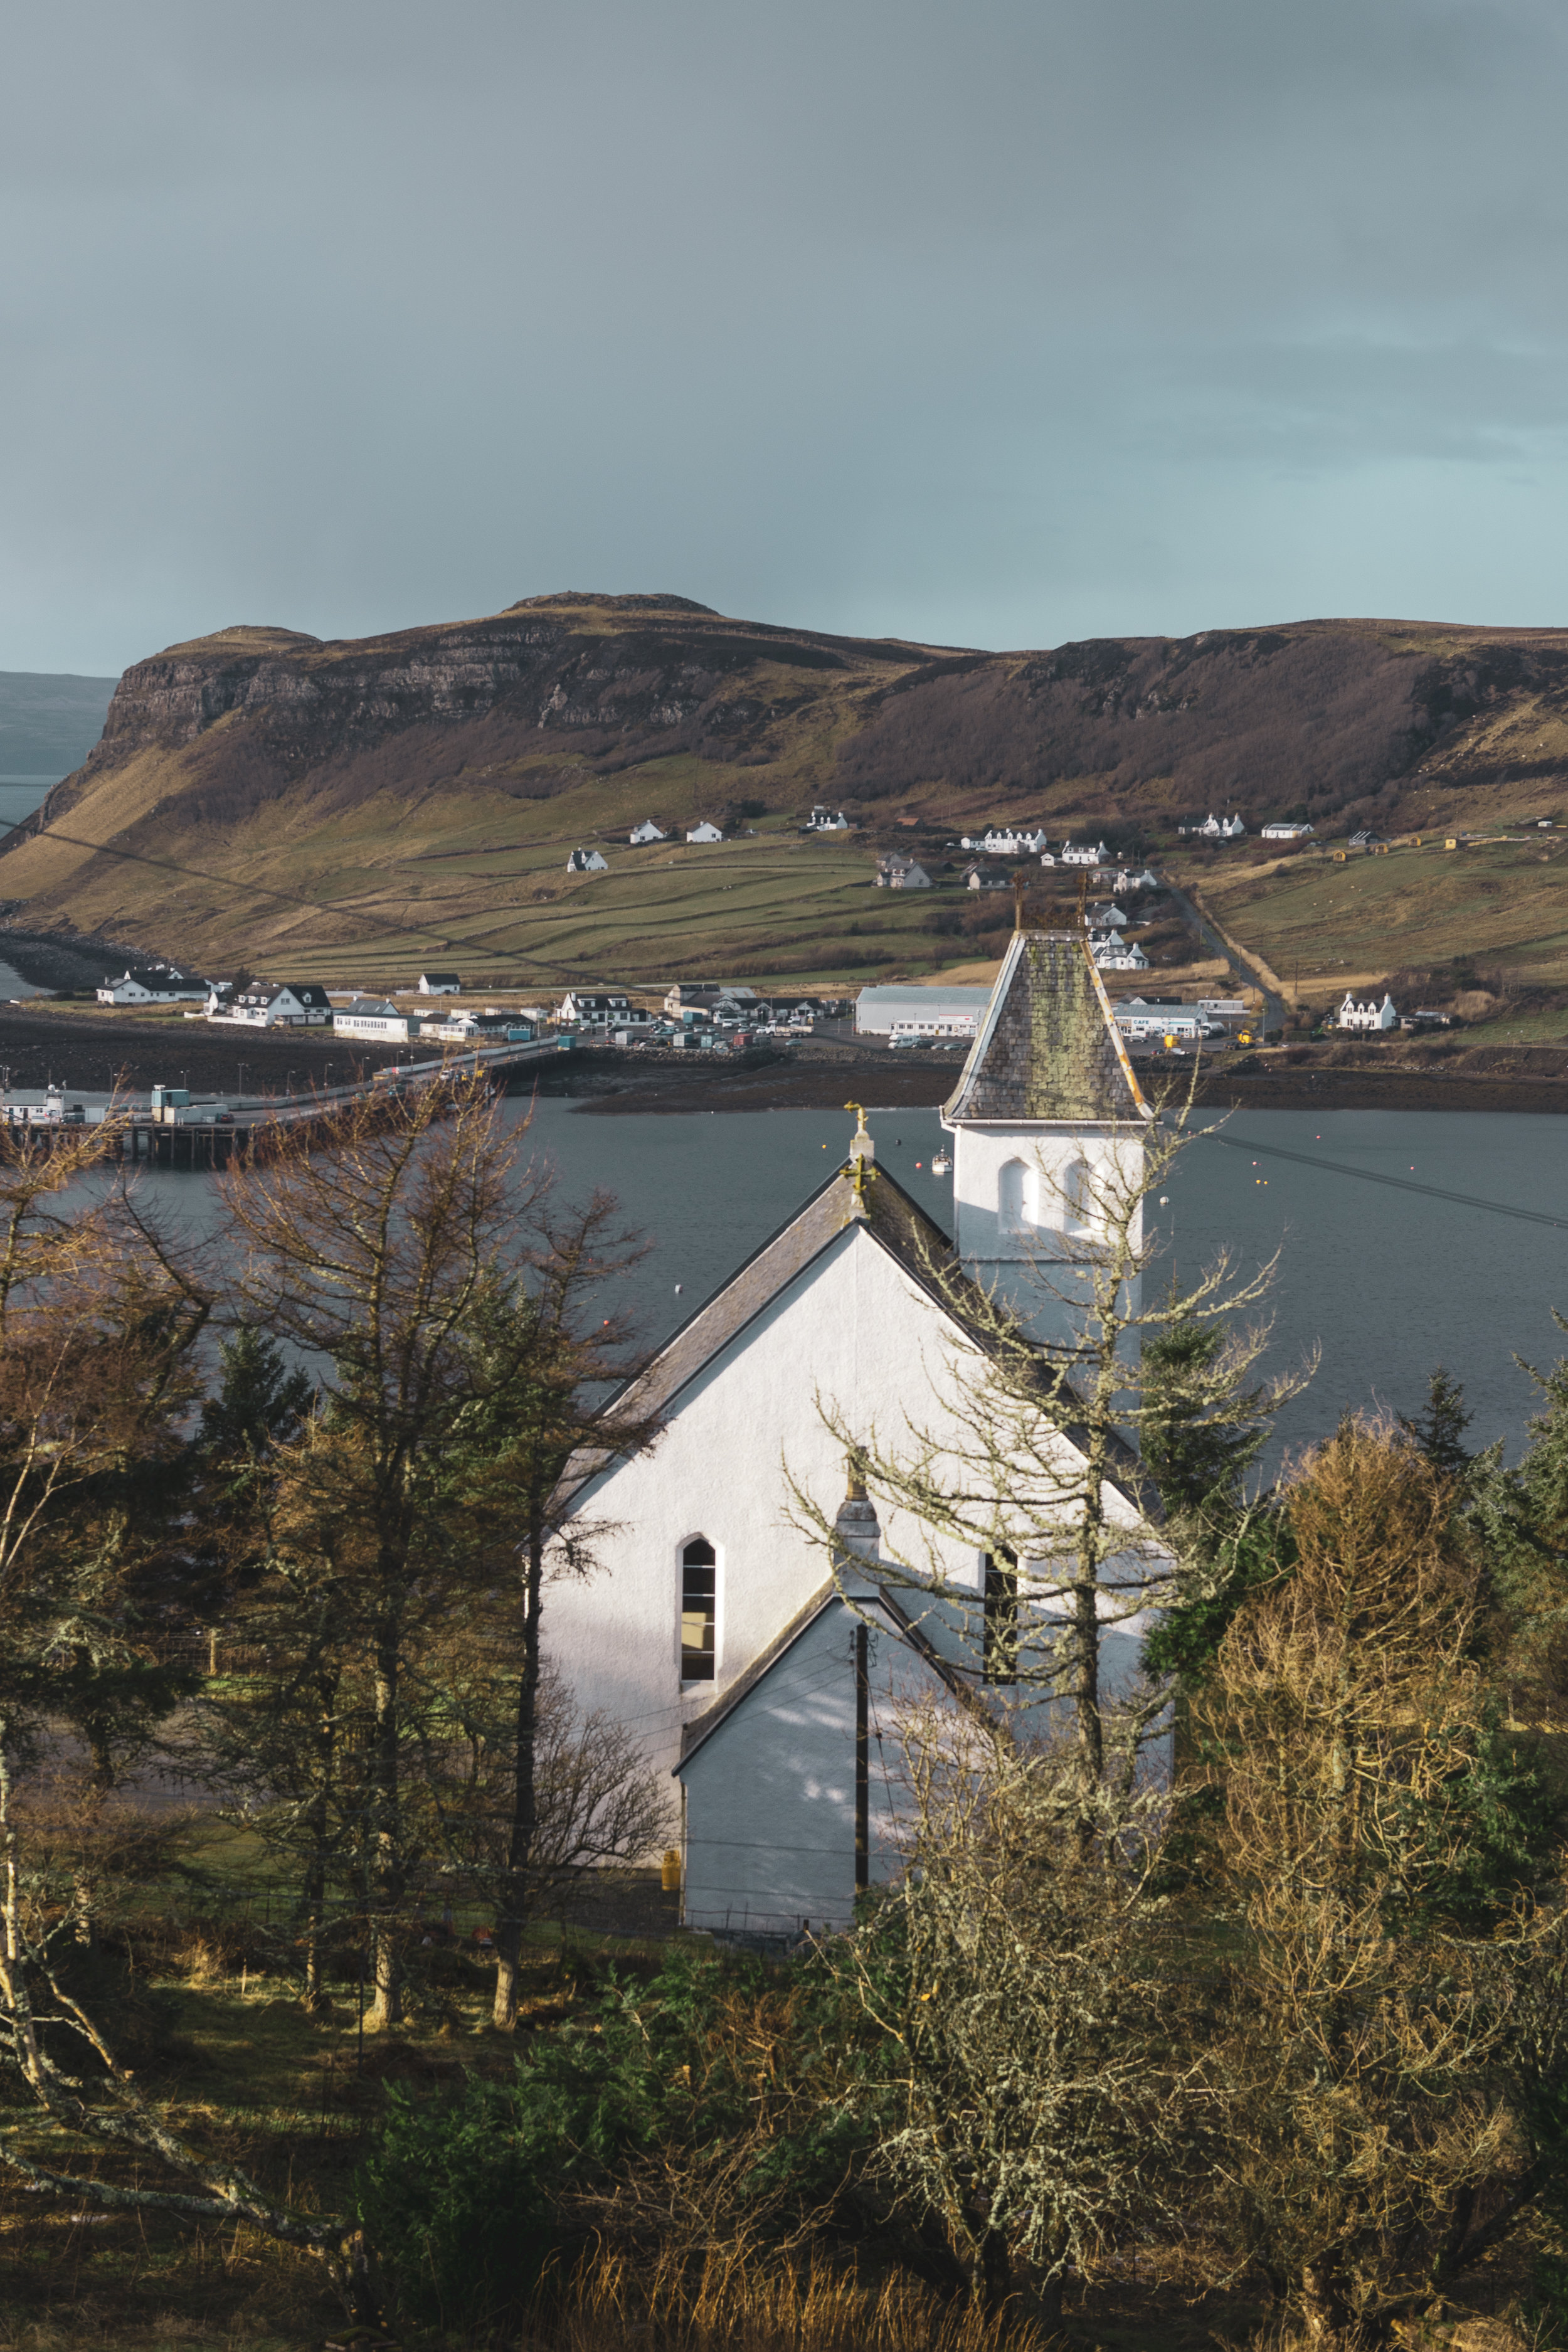 Isle-of-Skye-Fairy-Glen-und-Braes (9).jpg